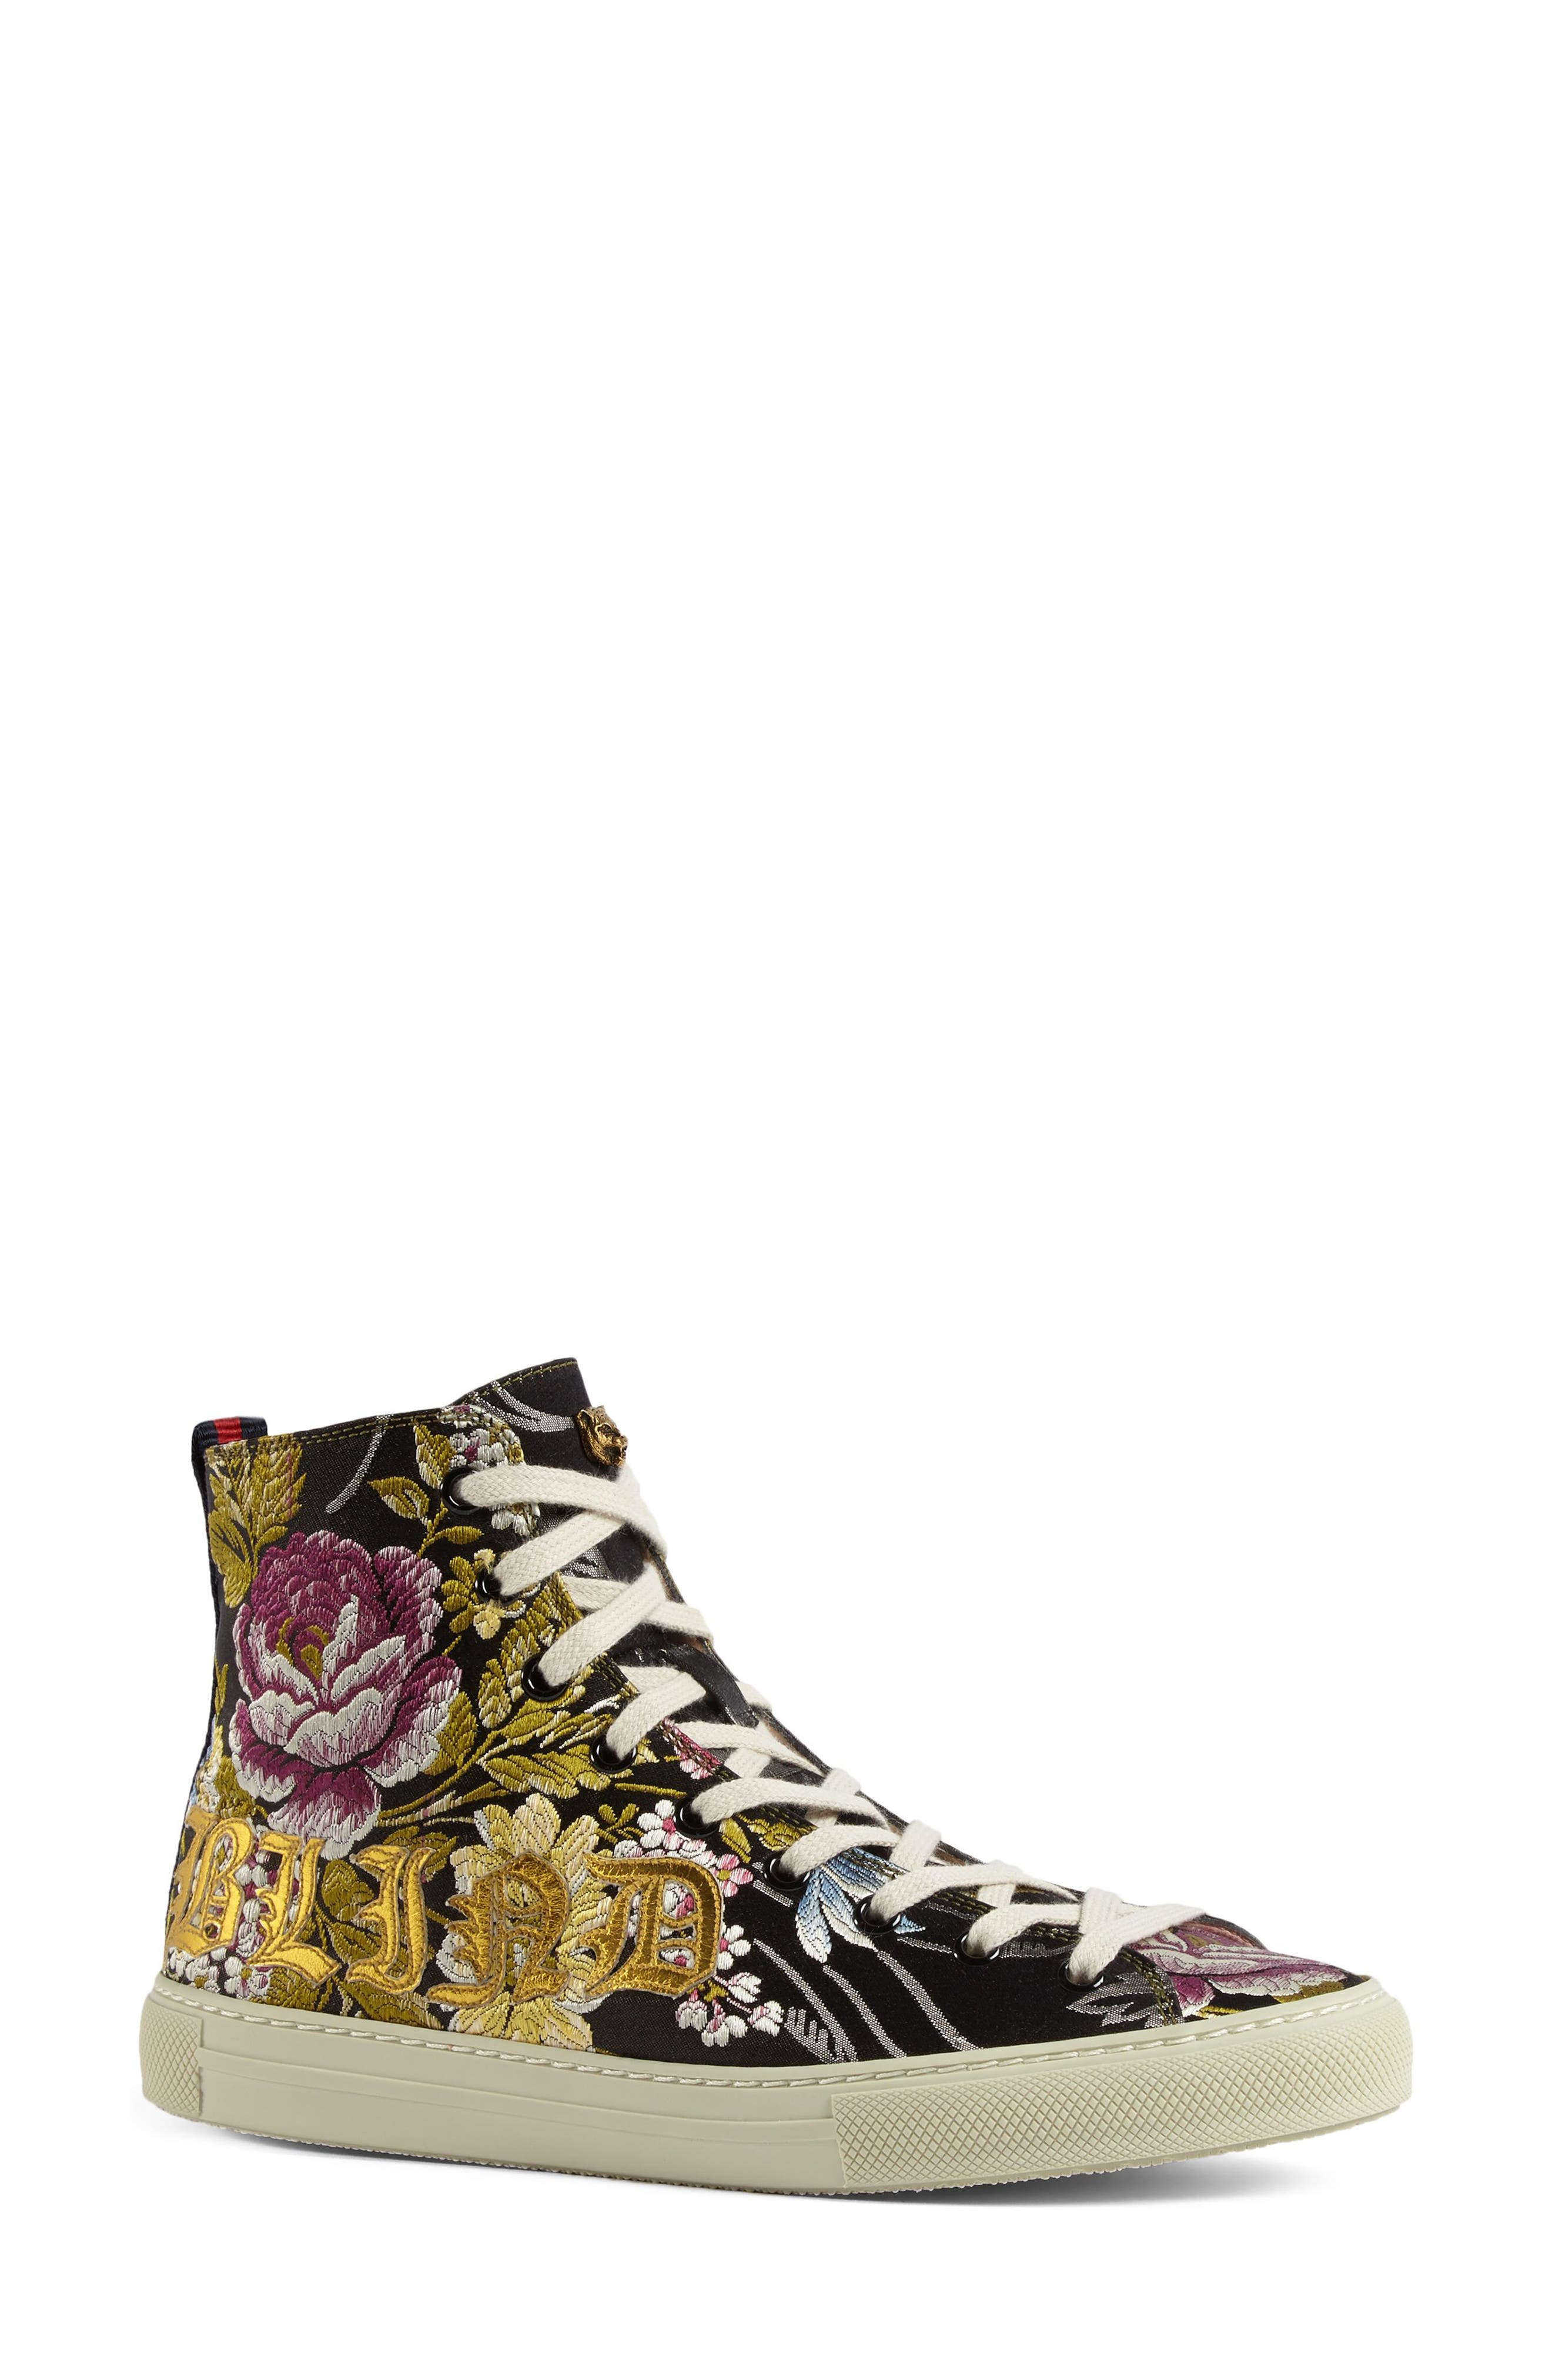 Alternate Image 2  - Gucci Floral High Top Sneaker (Women)